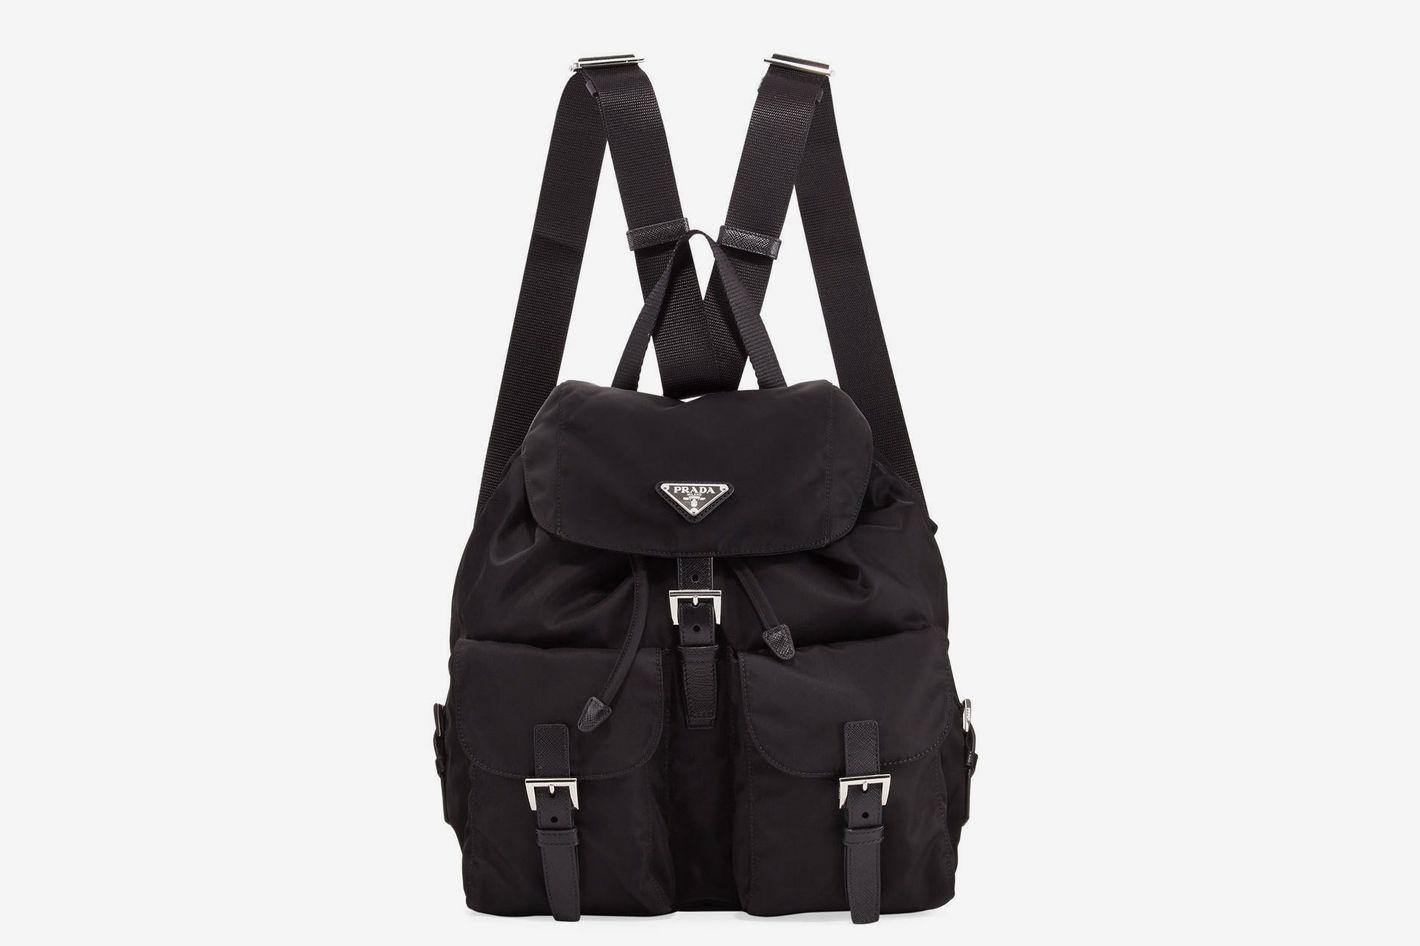 Prada Vela Large Two-Pocket Backpack